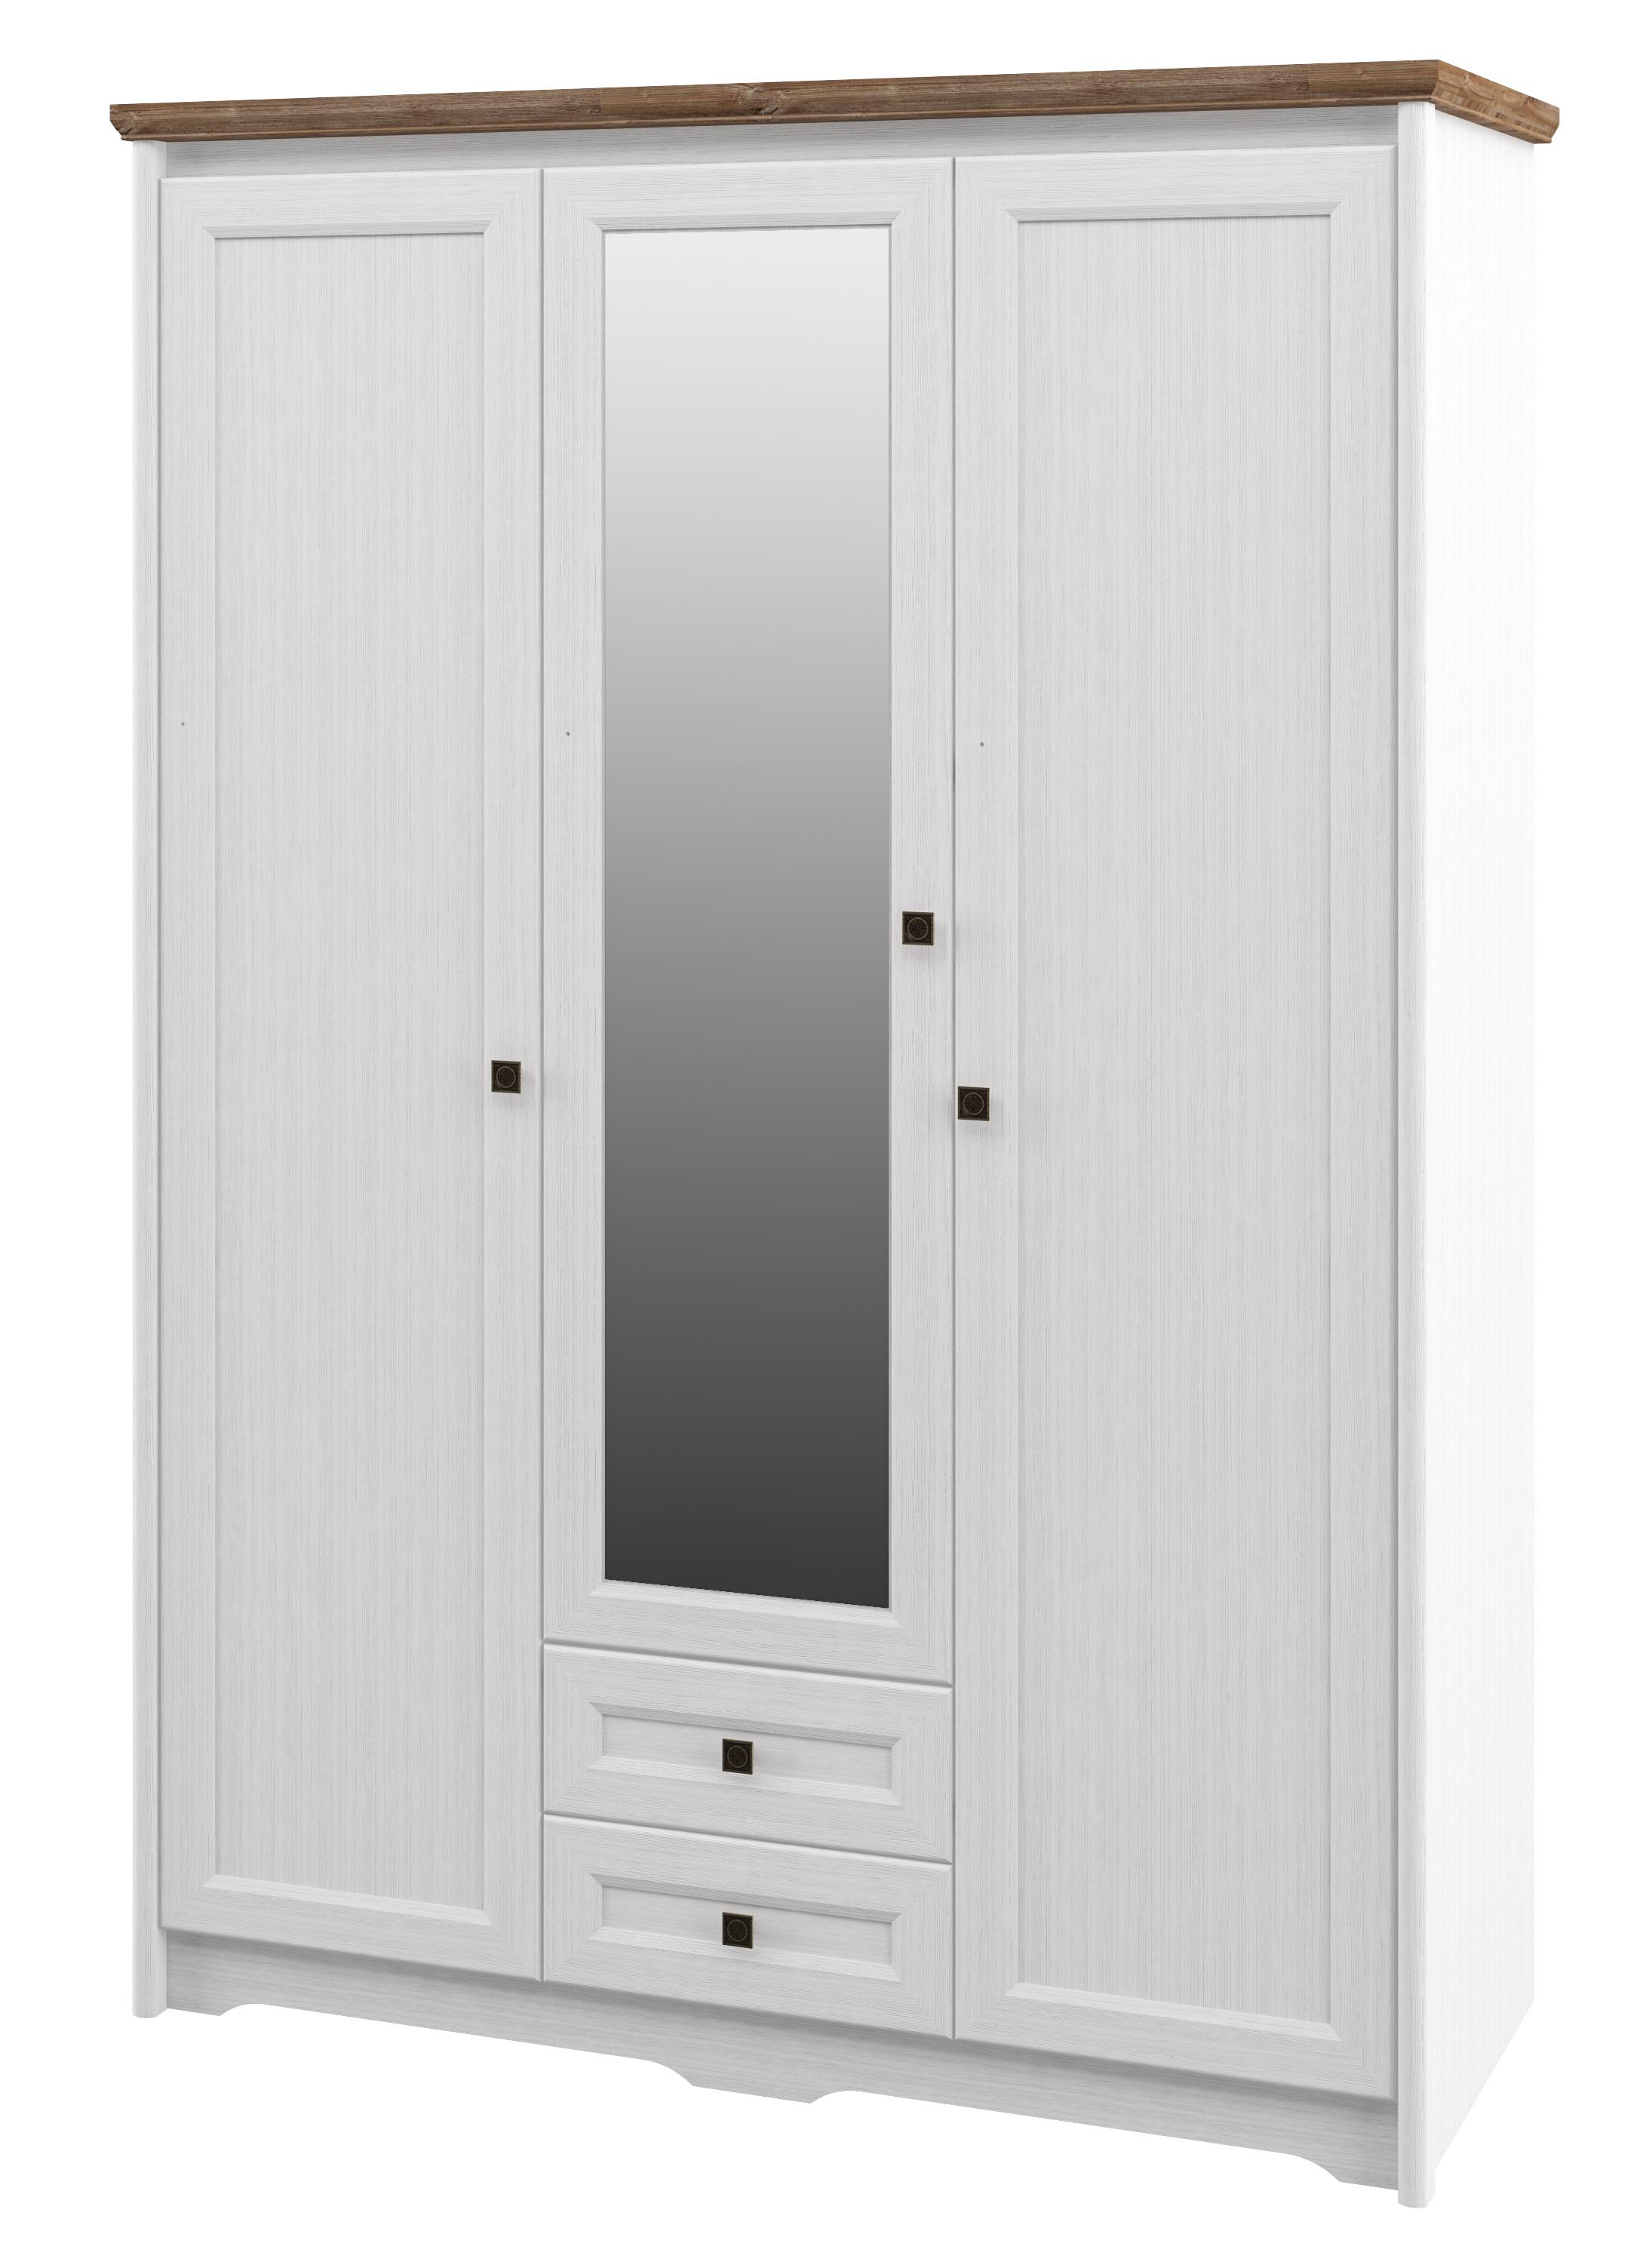 Neman Kleiderschrank 3-türig Tivoli Landhausstil Weiß